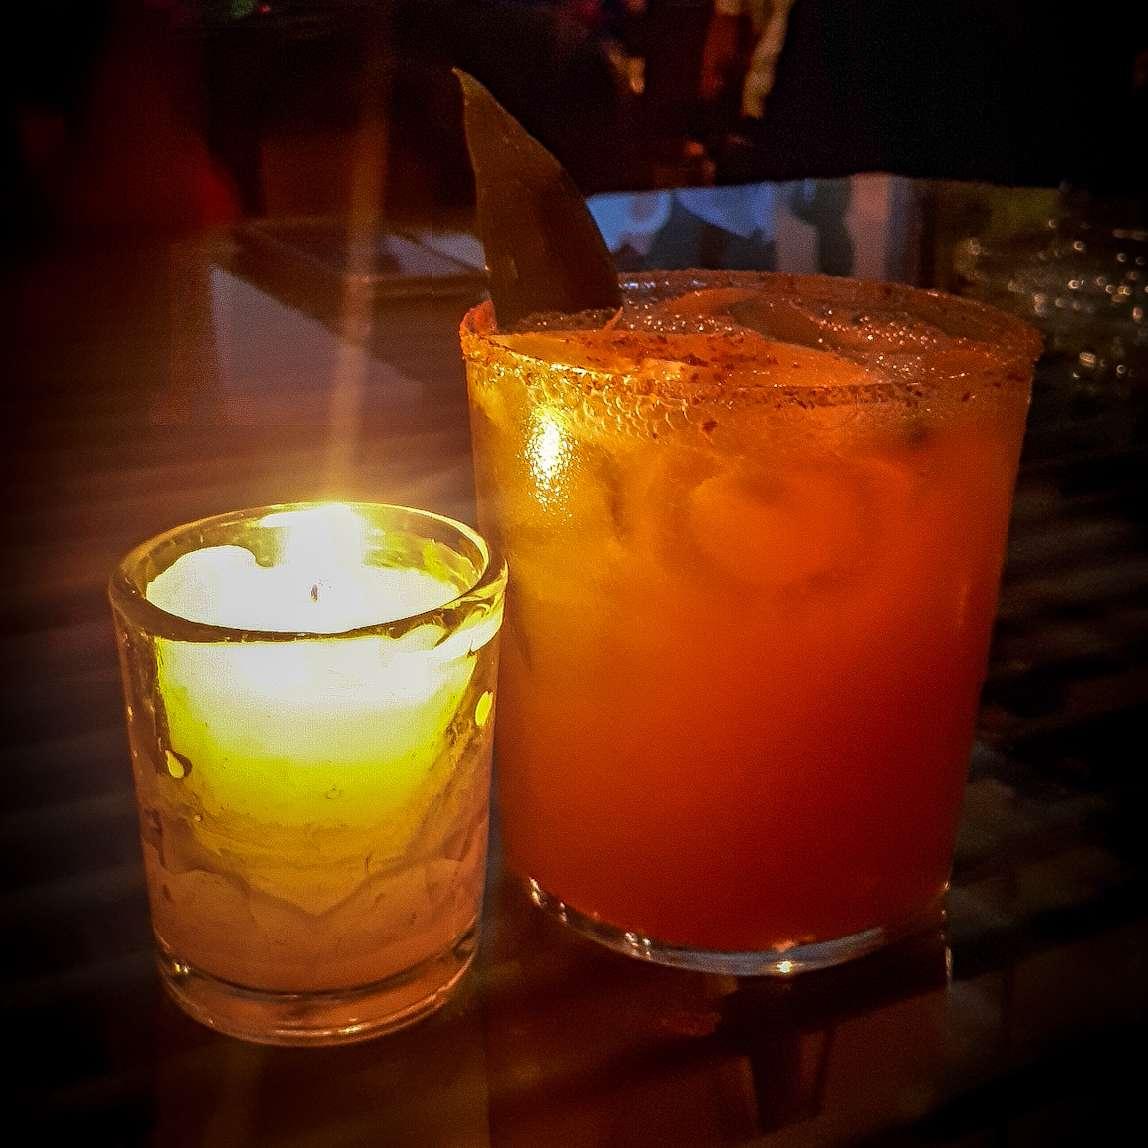 Hotel Casa Awolly Bar Review